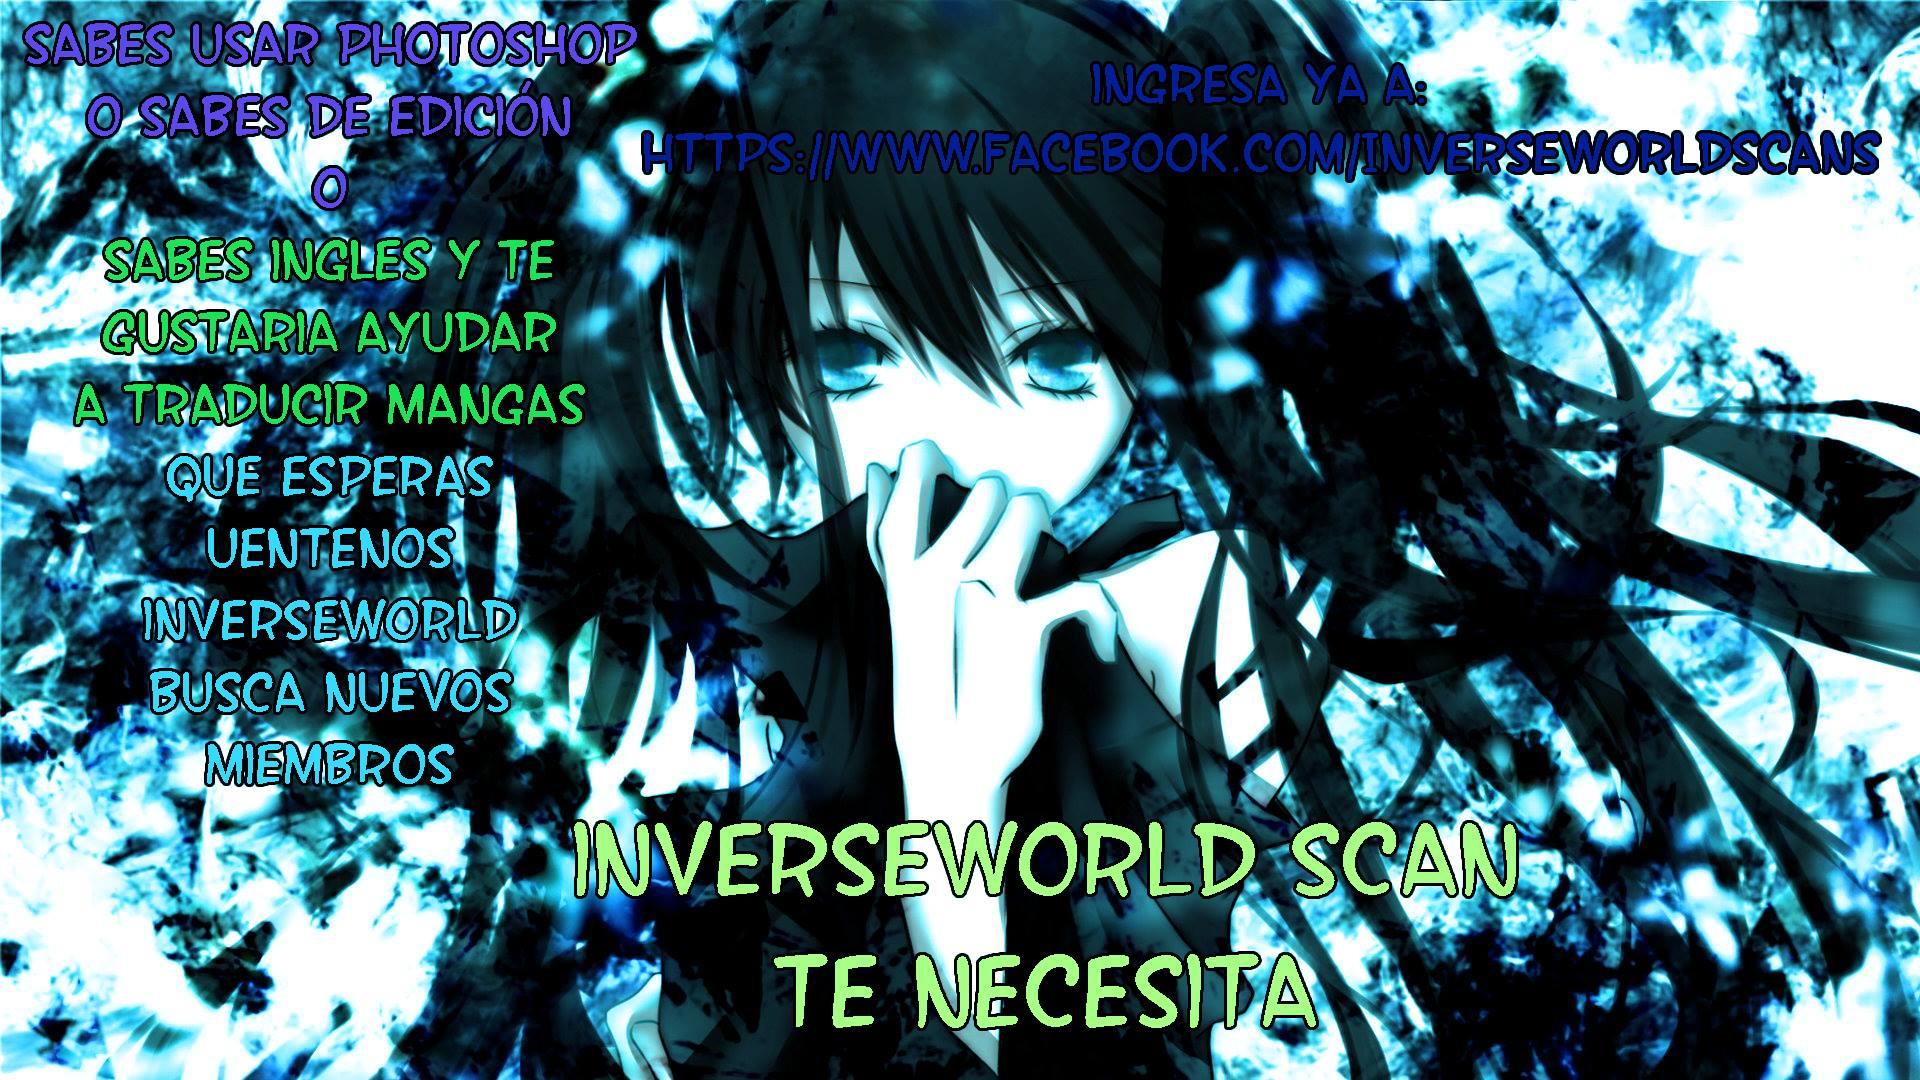 https://c5.mangatag.com/es_manga/18/16210/415314/ed556265816011ba76a53e5cf54450cf.jpg Page 1